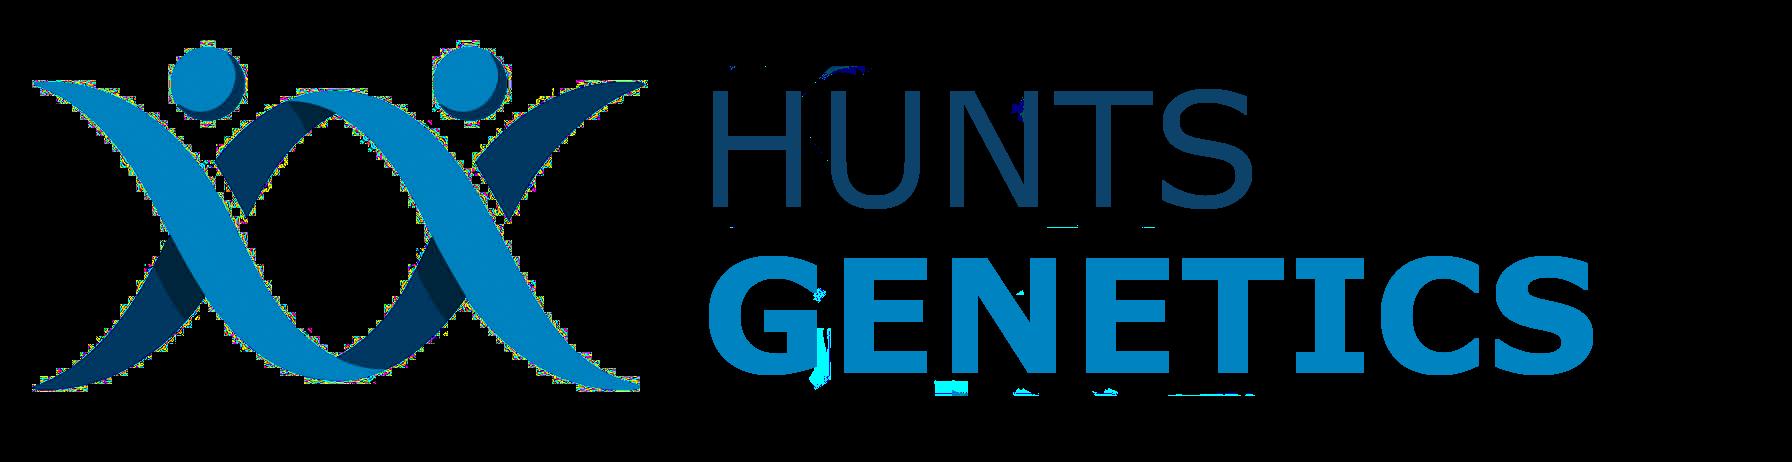 Hunts Genetics